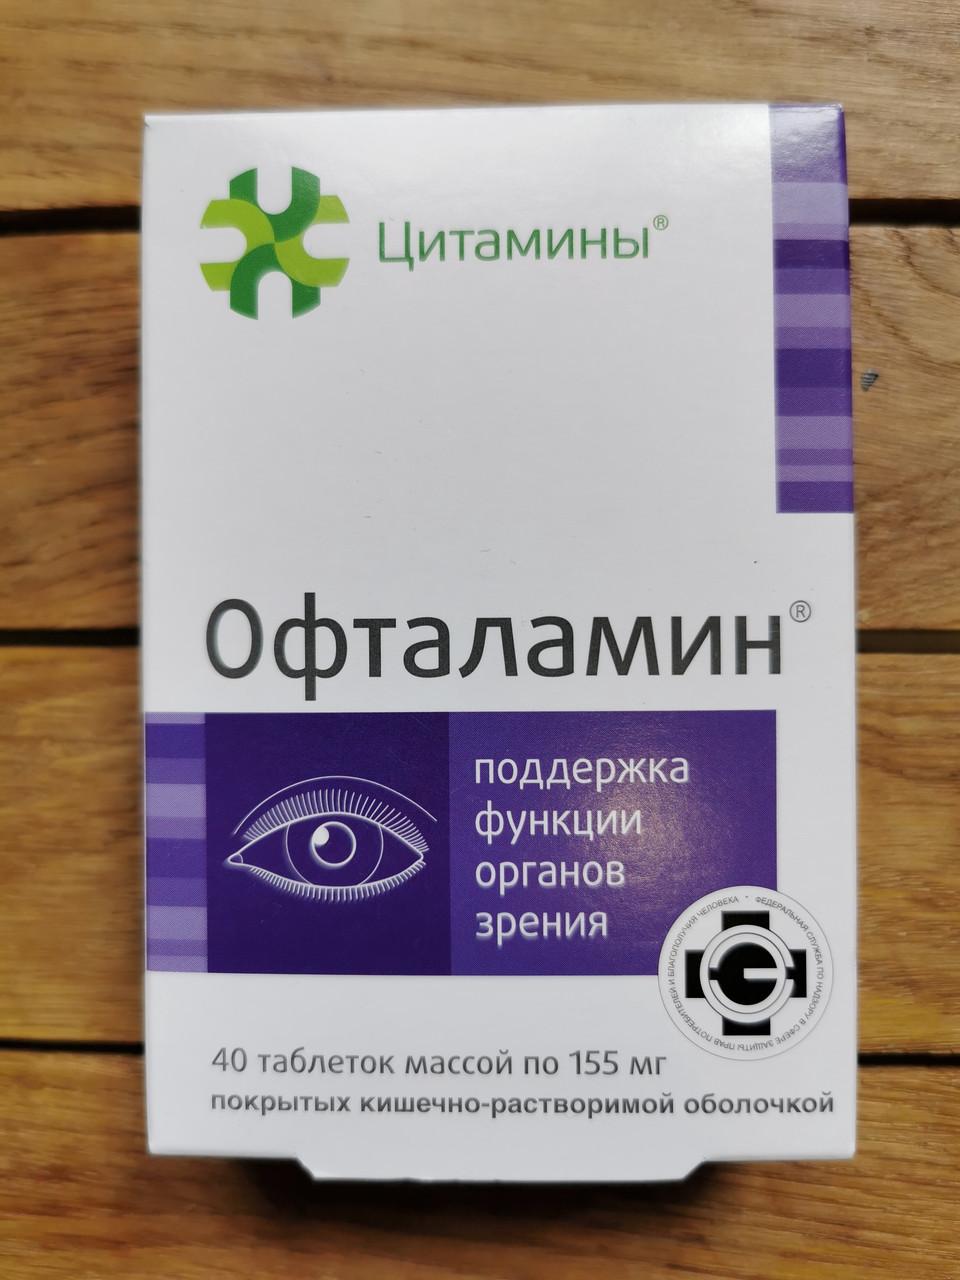 Офталамин, 40 таб., Цитамины